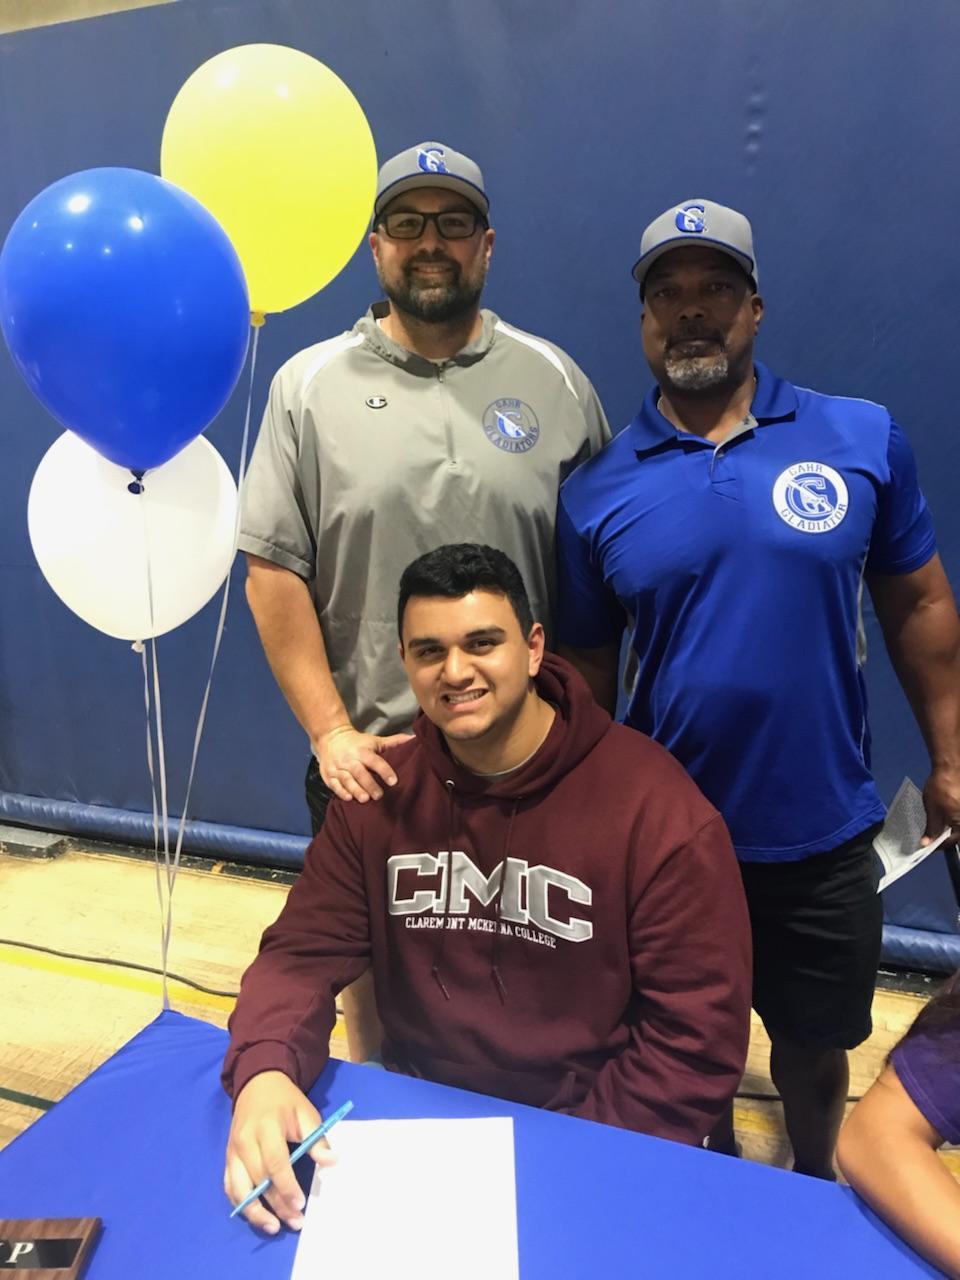 2018 Football Signee: Mason Hernandez will play at Claremont Mckenna College